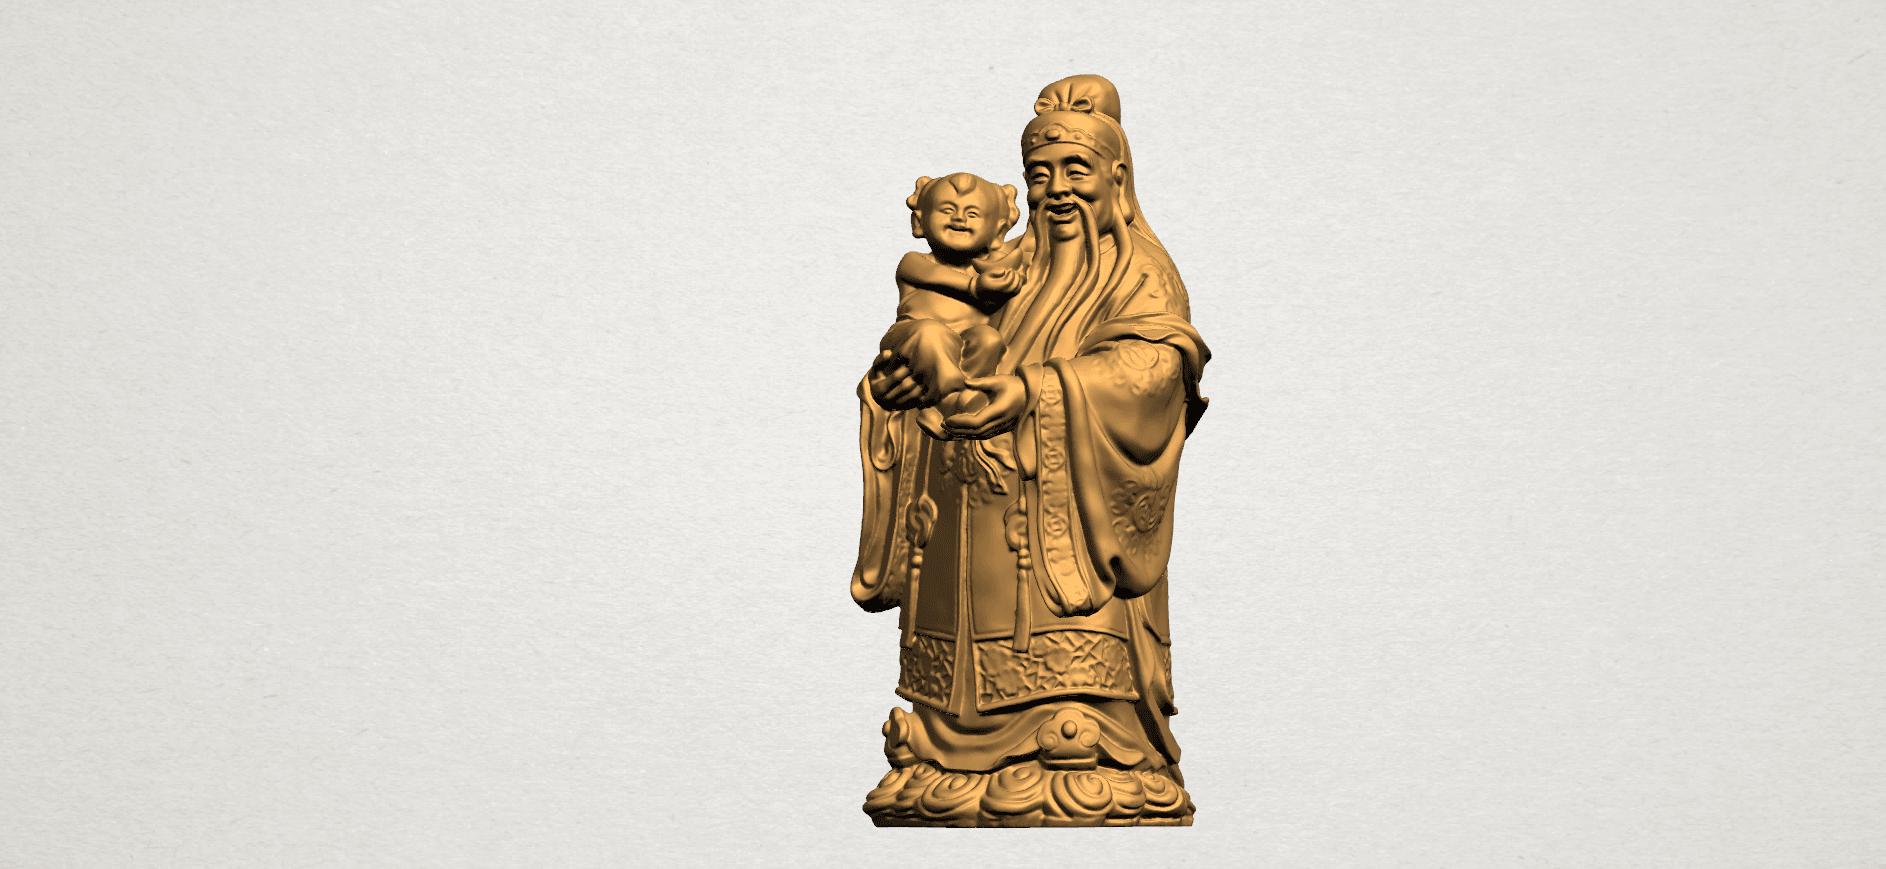 Fook (Fook Look Sao) 80mm - A01.png Download free STL file Fook (Fook Look Sao) • 3D printer template, GeorgesNikkei